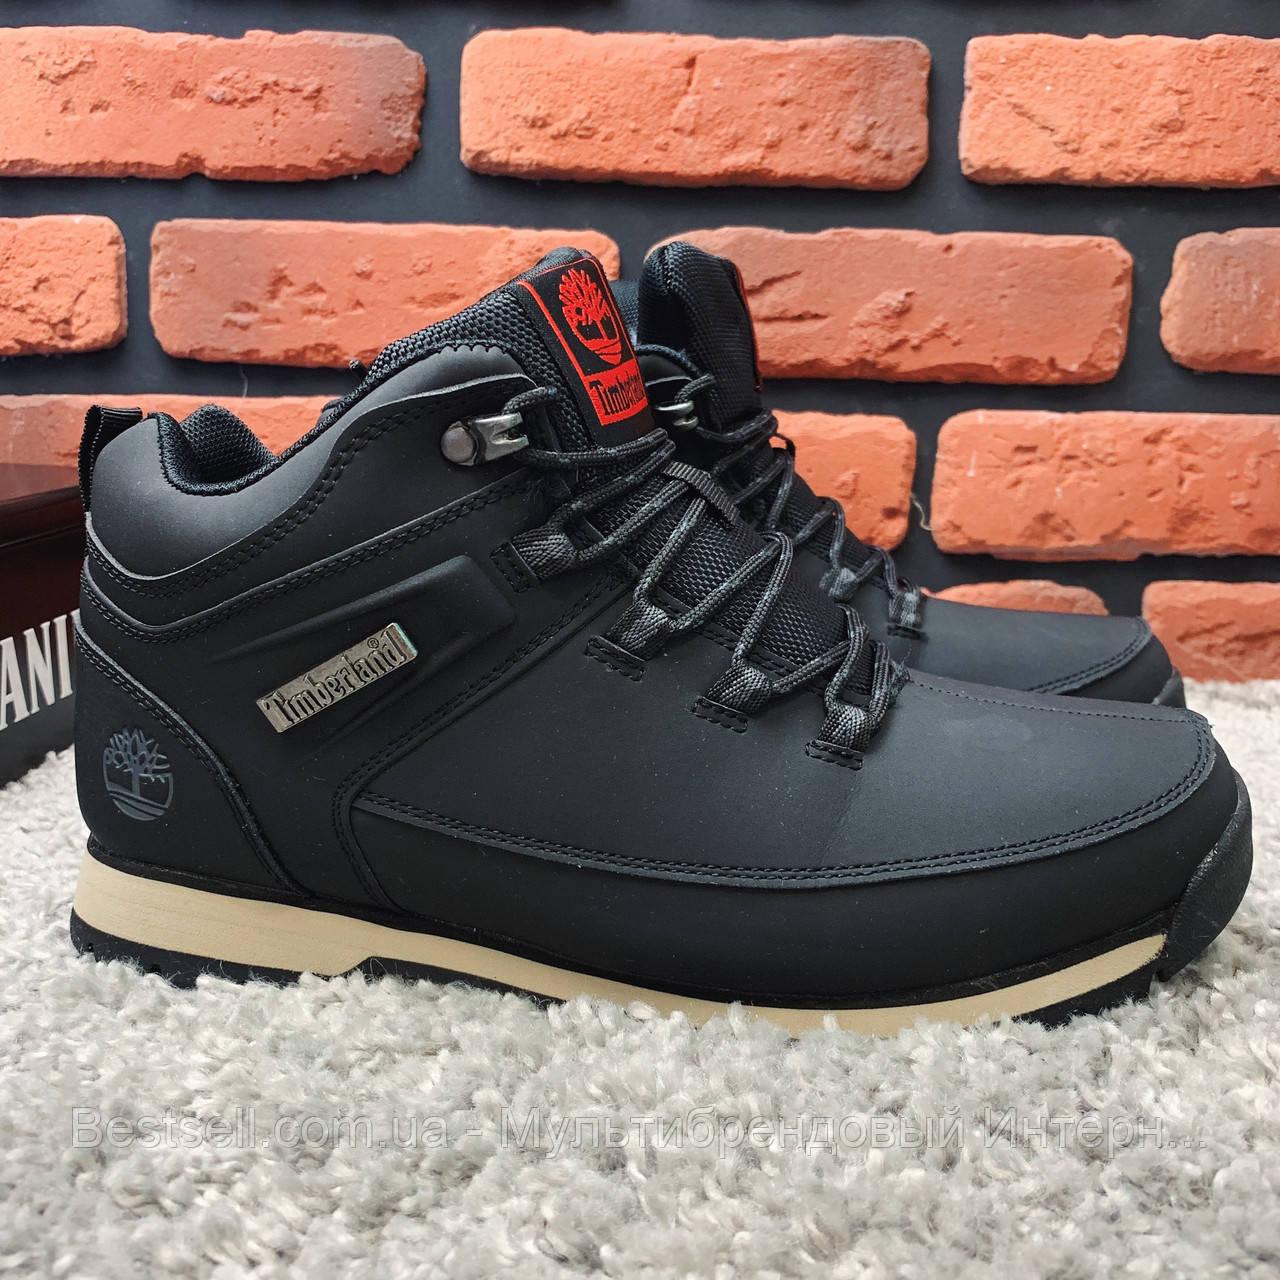 Зимние ботинки (на меху) Timberland  11-002 ⏩ [ 41,42,44 ]